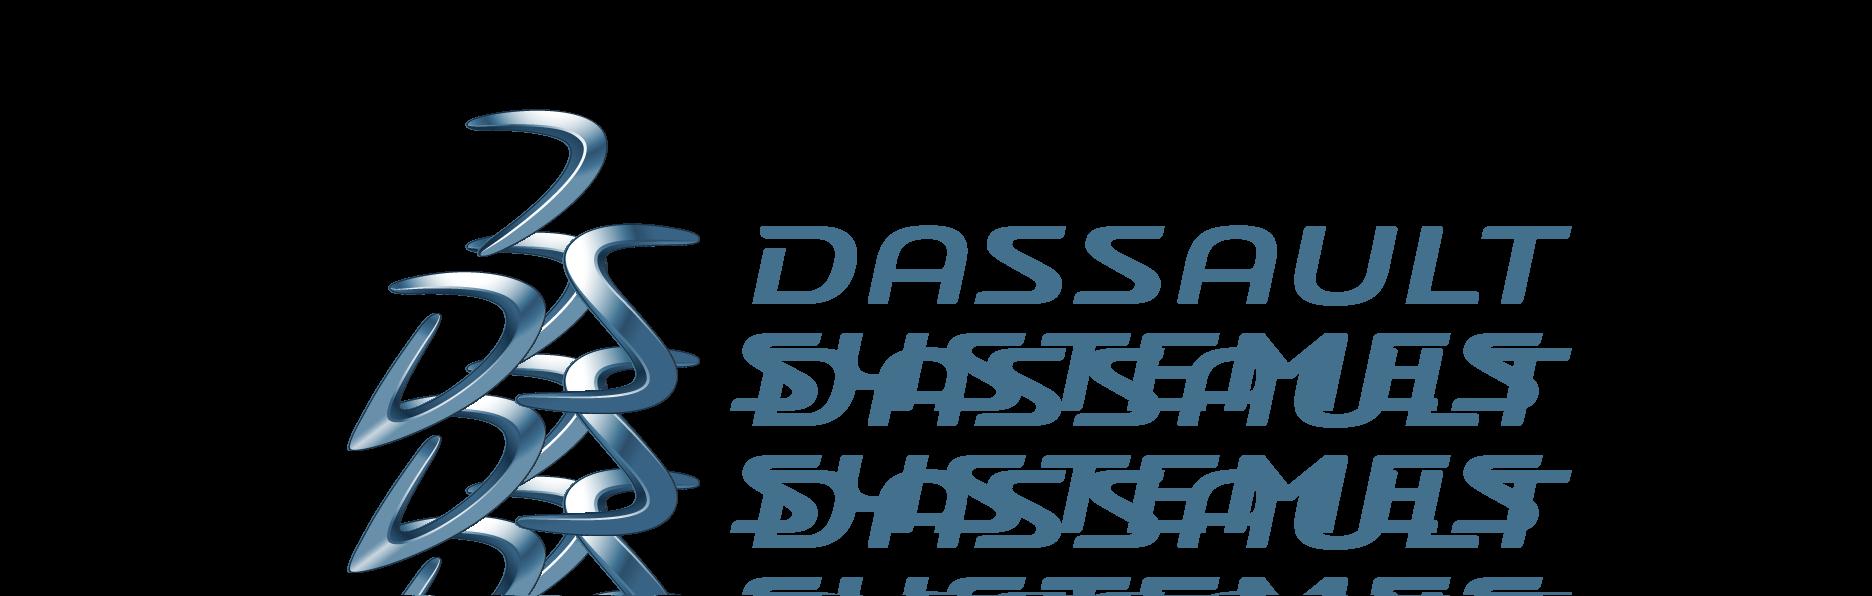 Dassault Systemes CAD/CAM